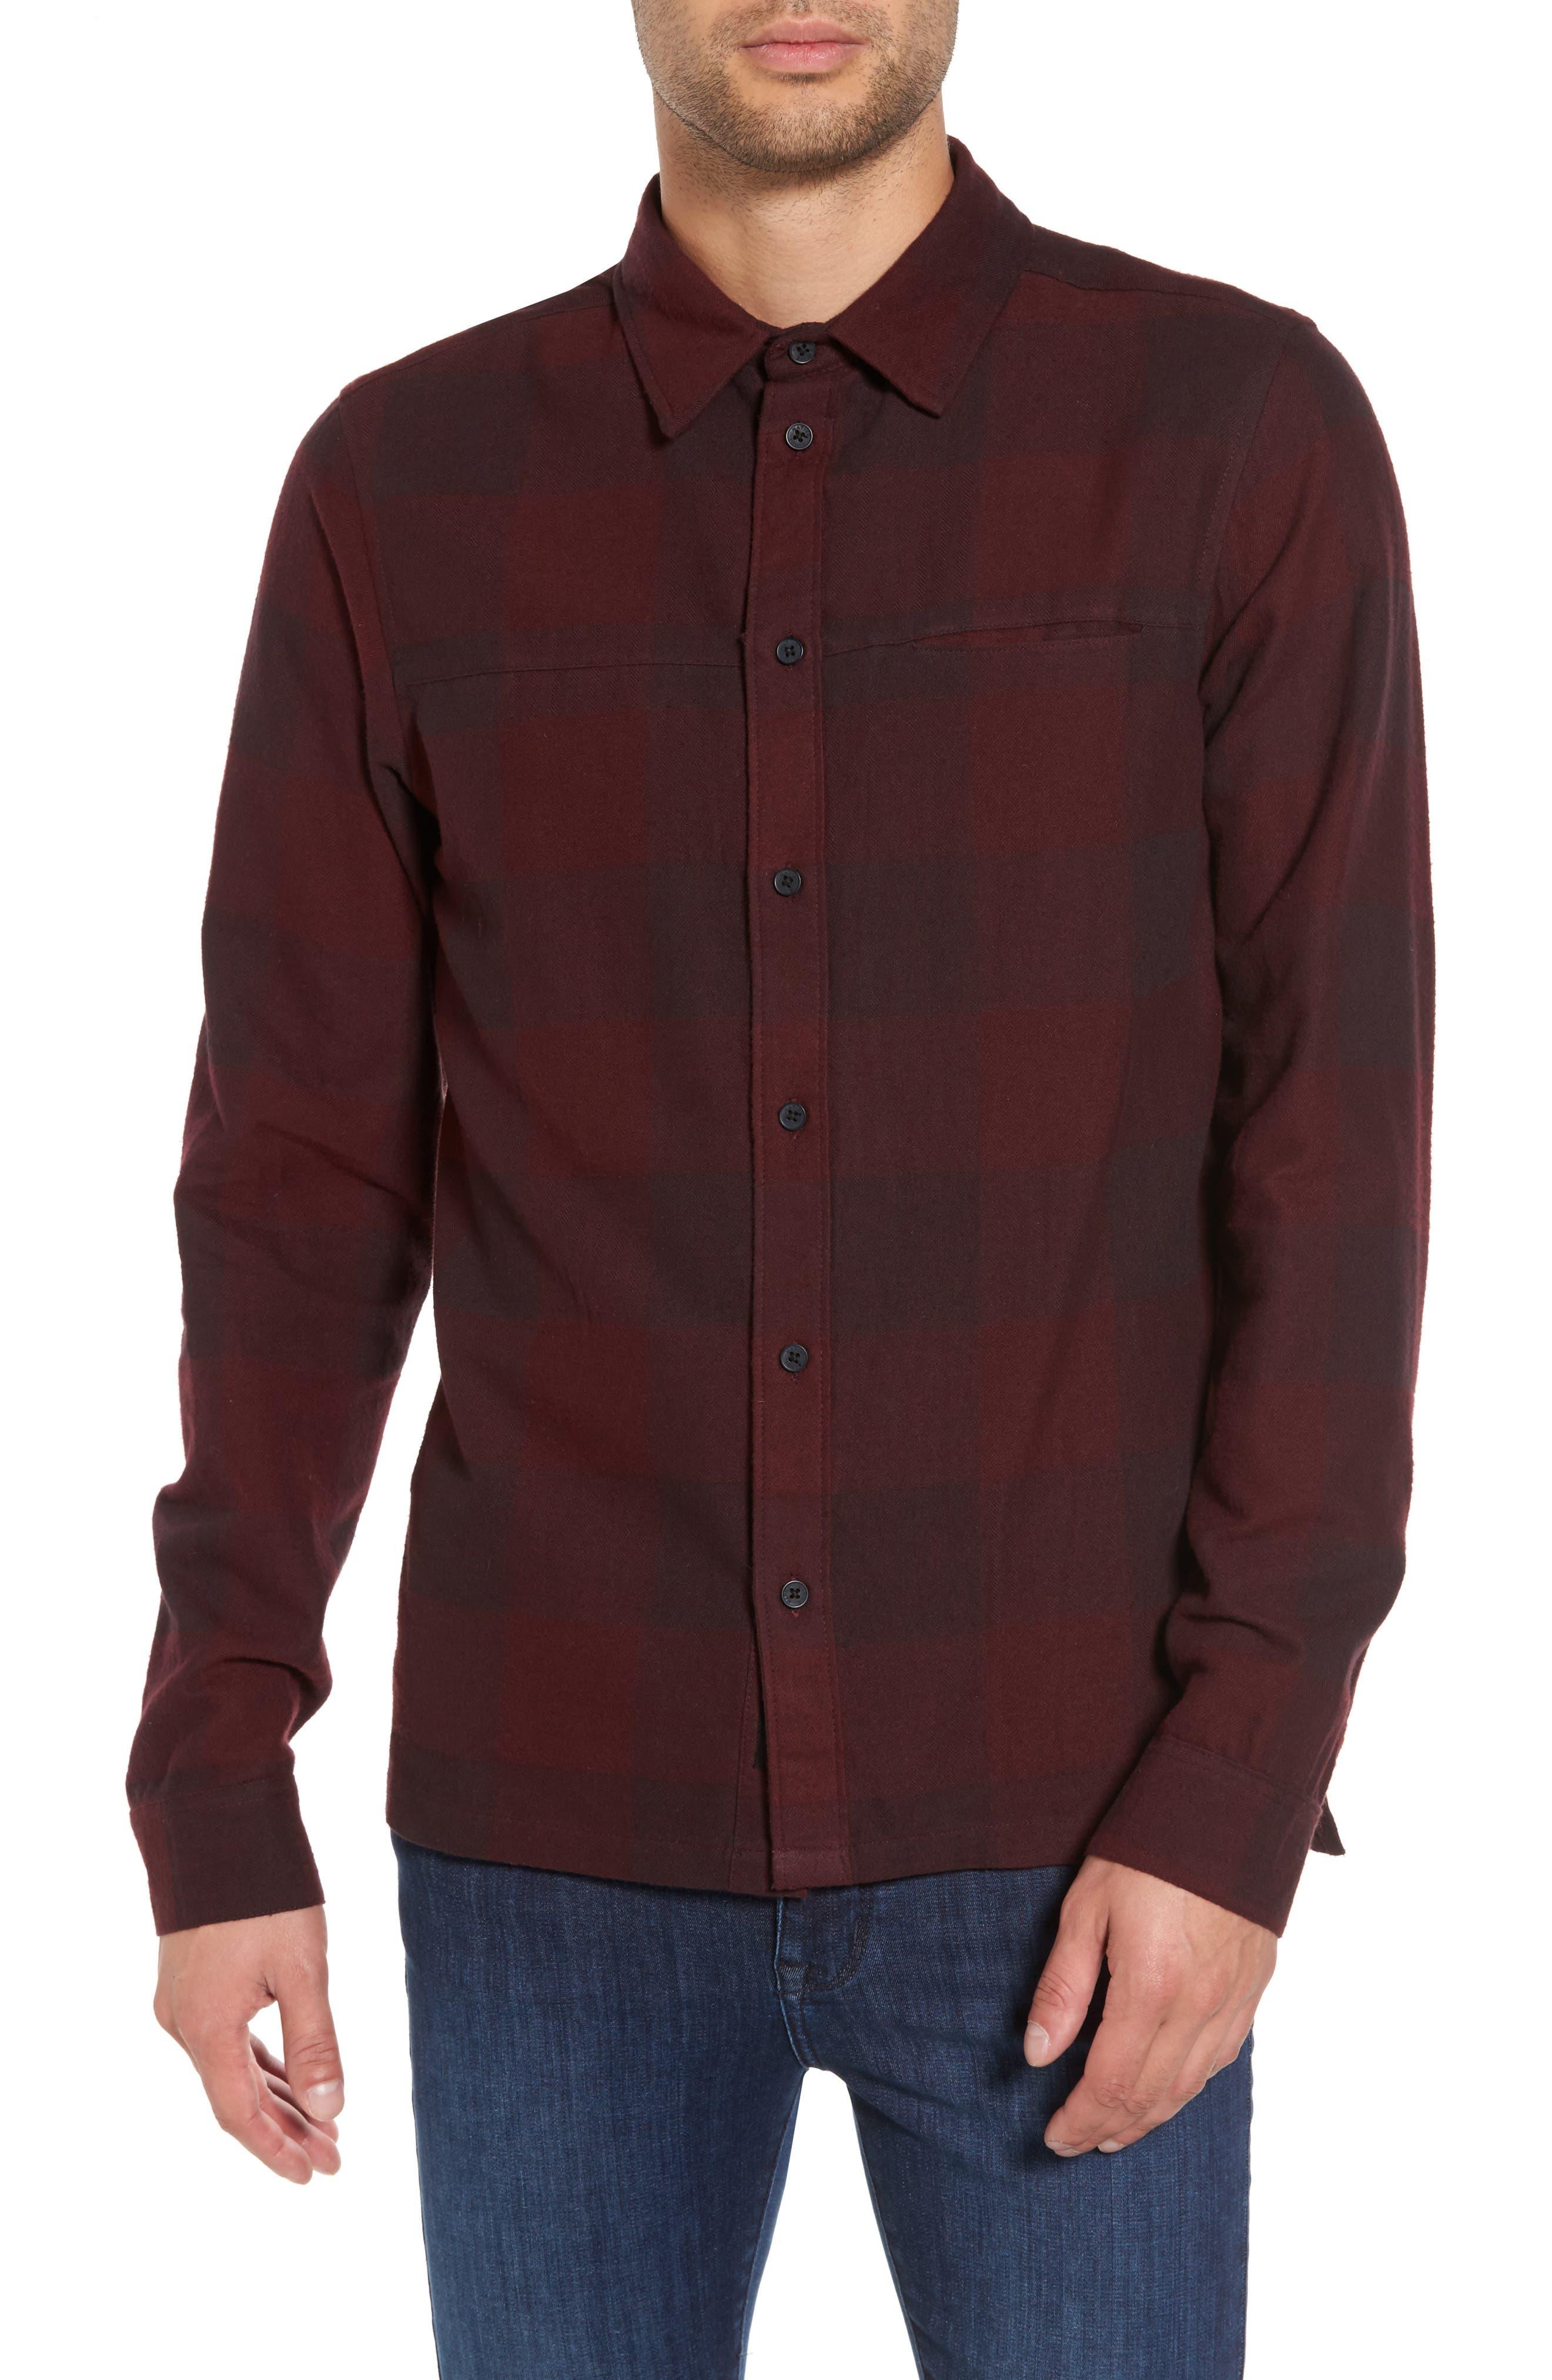 Chalgrove Buffalo Plaid Flannel Sport Shirt,                         Main,                         color, Burgundy